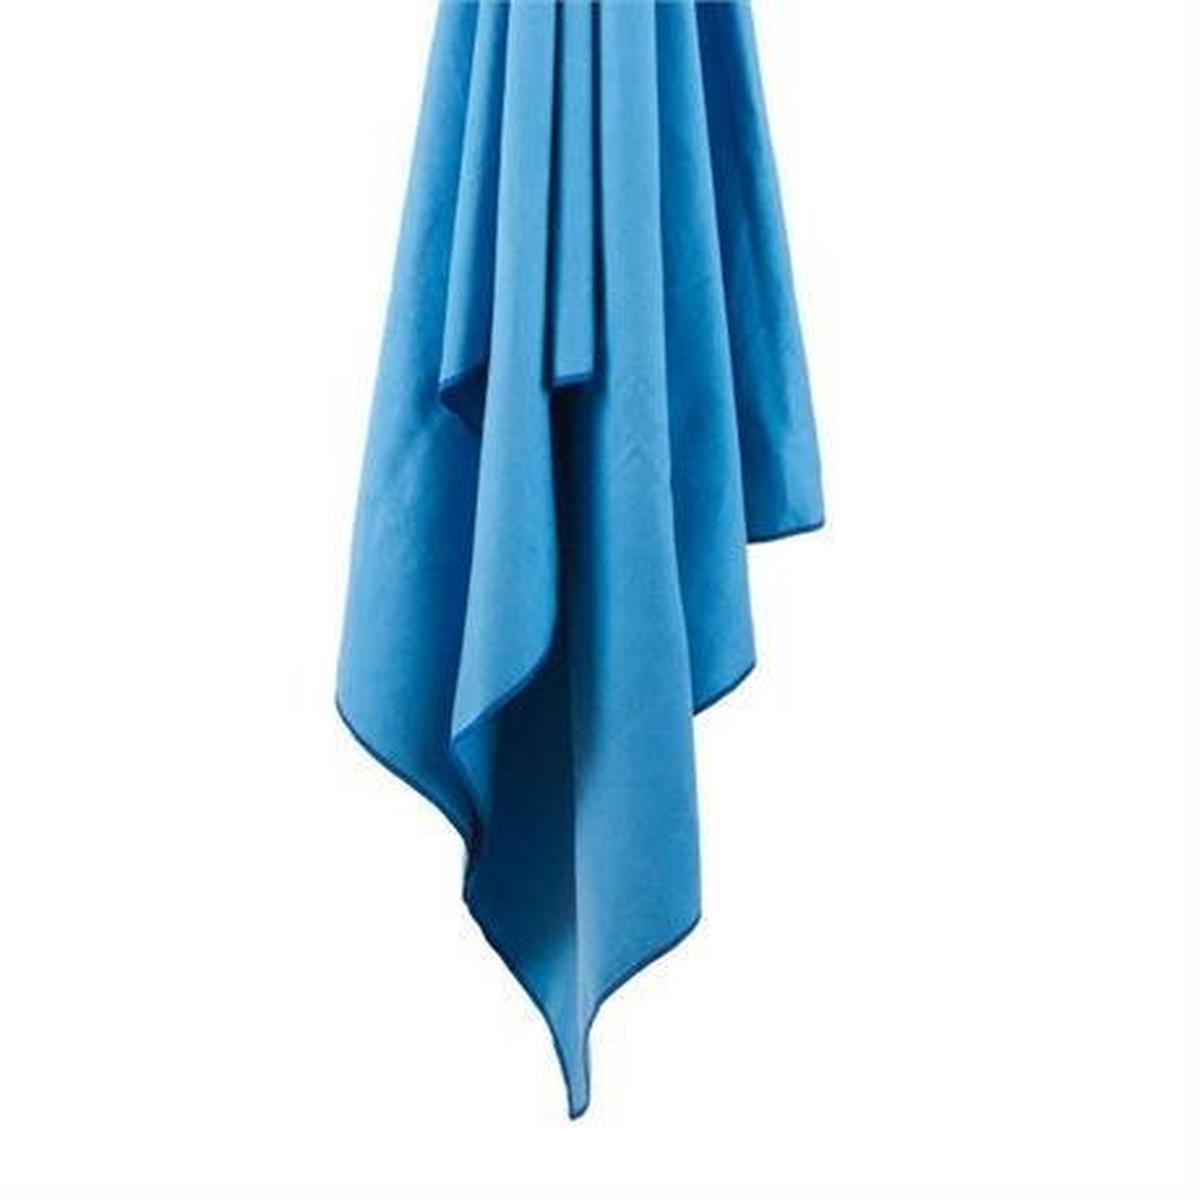 Lifeventure SoftFibre Travel Towel - Large, Blue